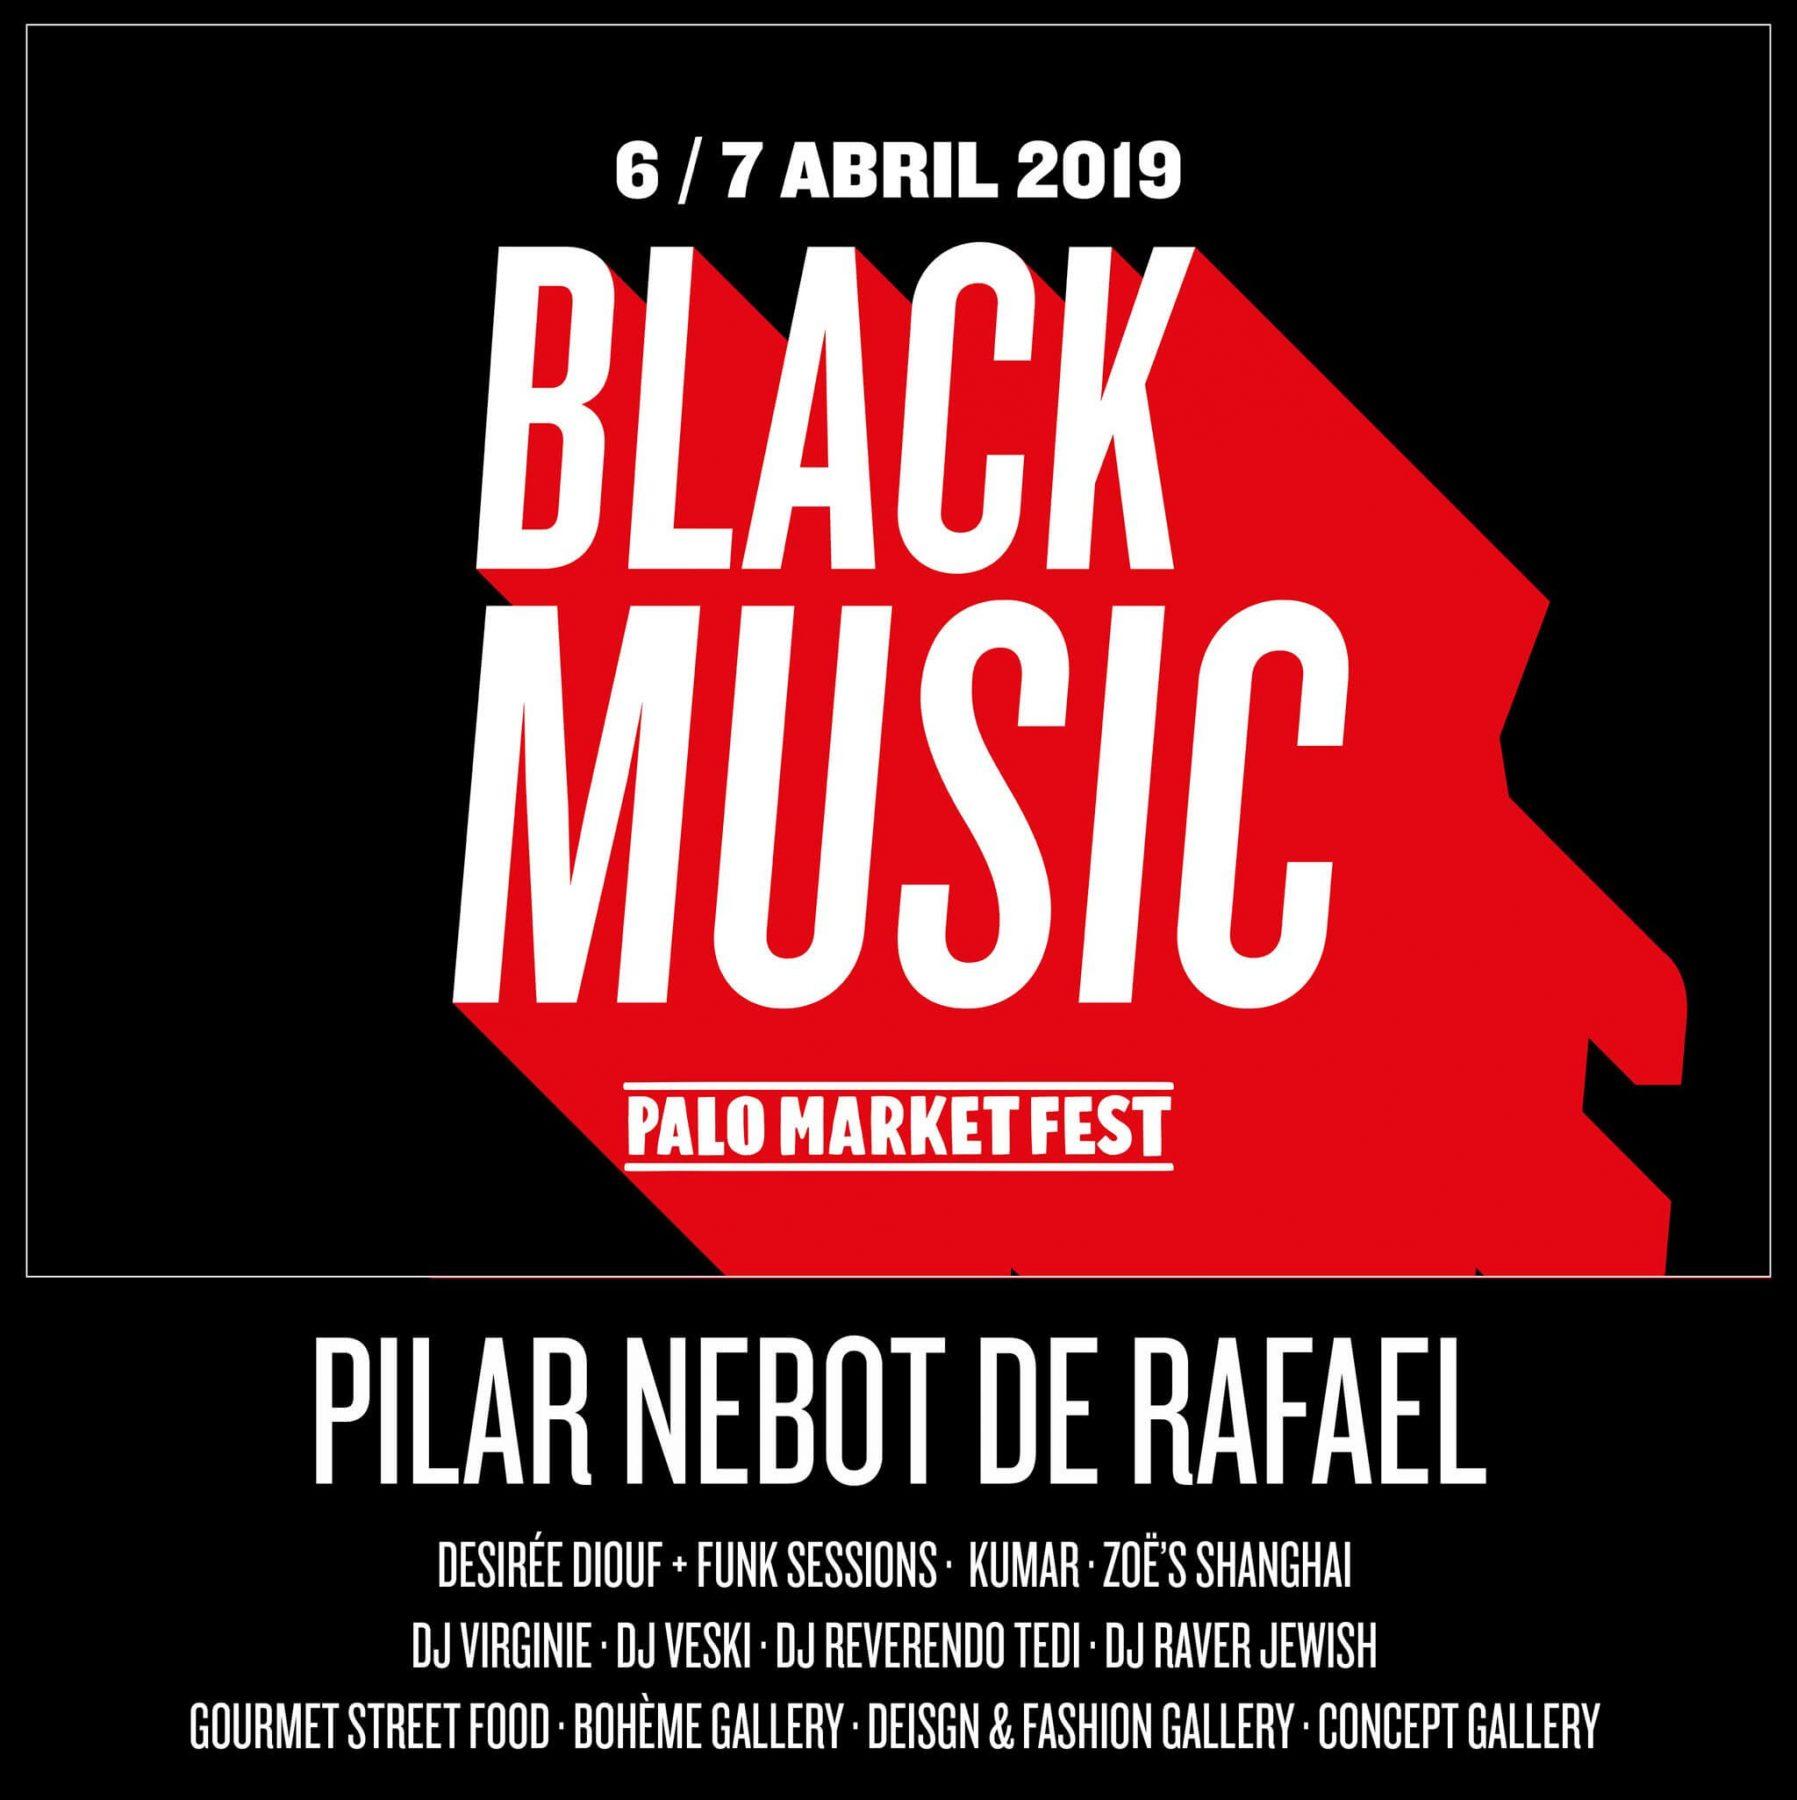 Palo Market Fest y la diseñadora Pilar Nebot de Rafael